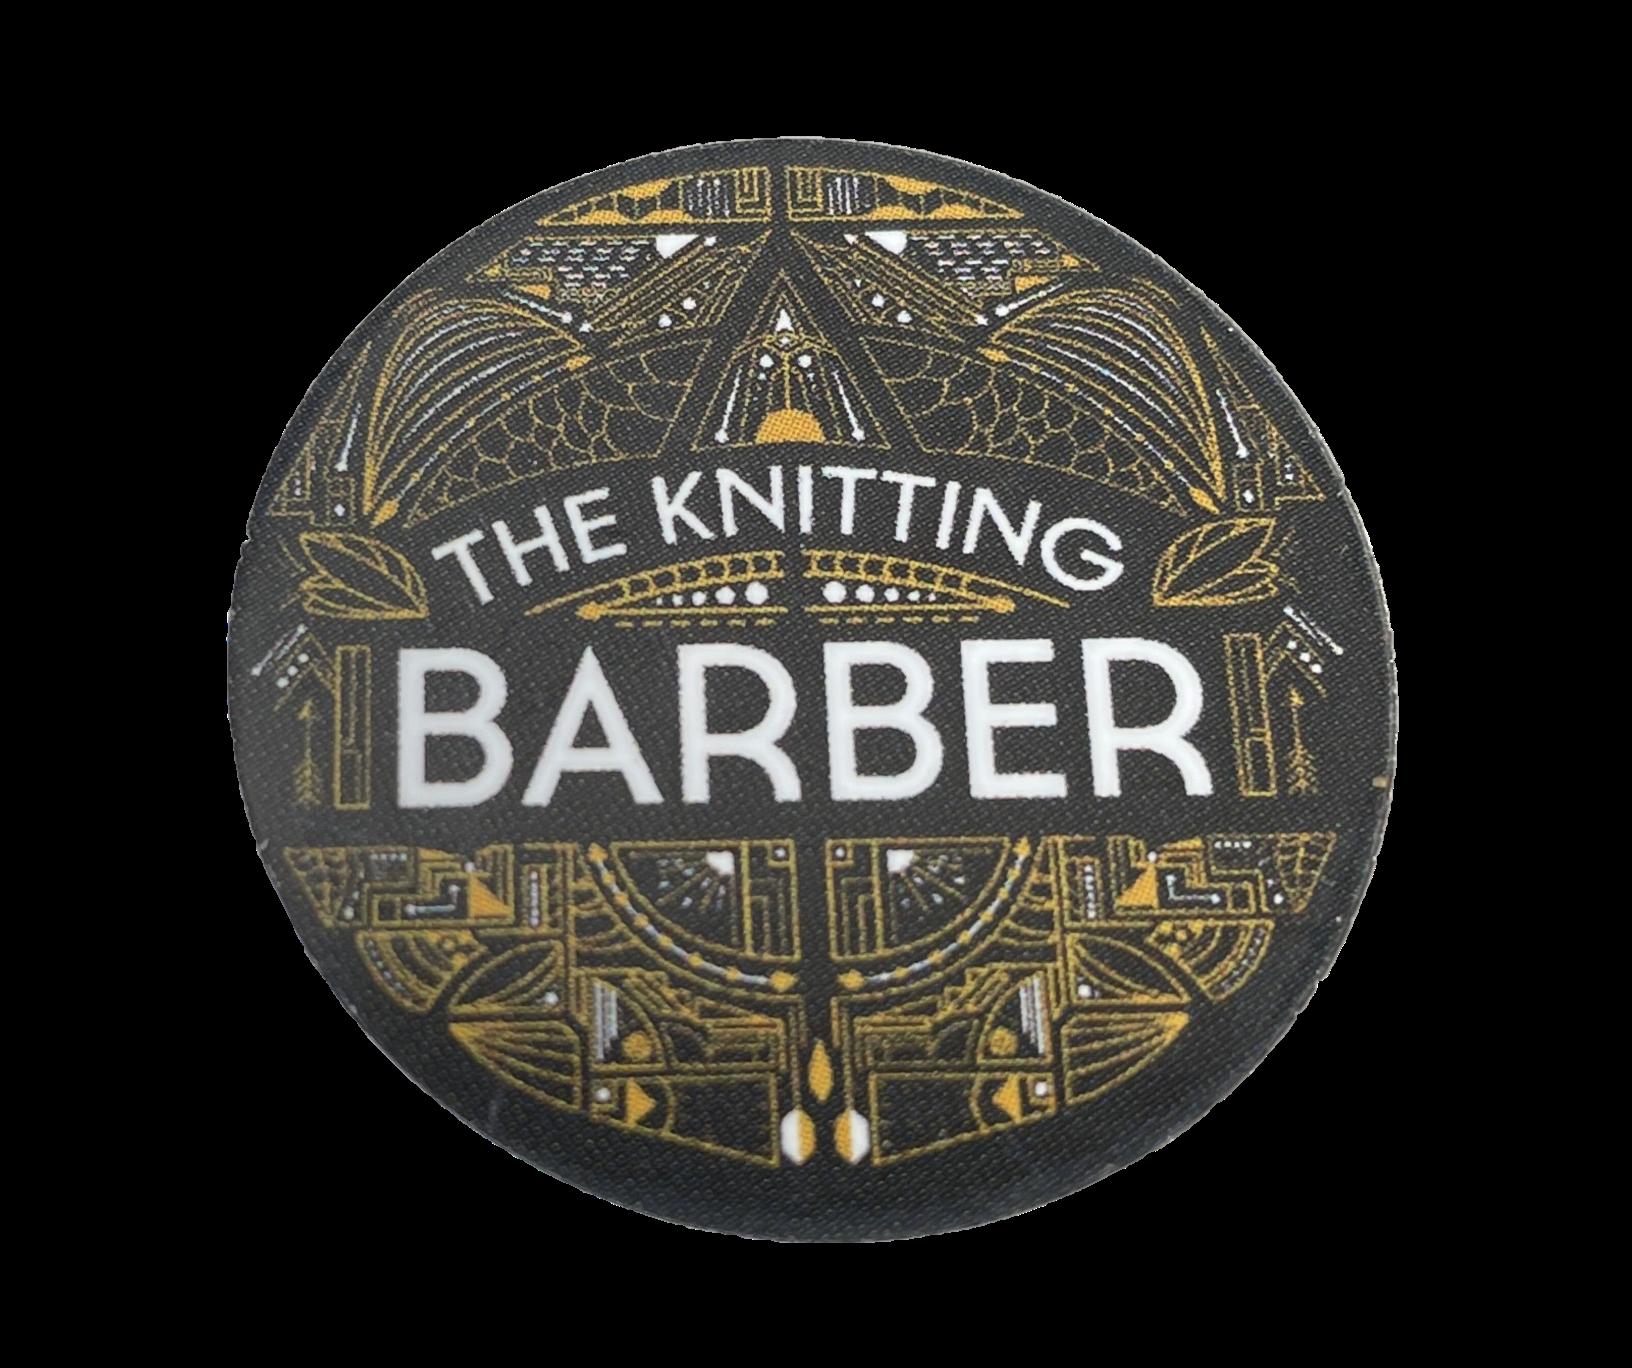 The Knitting Barber